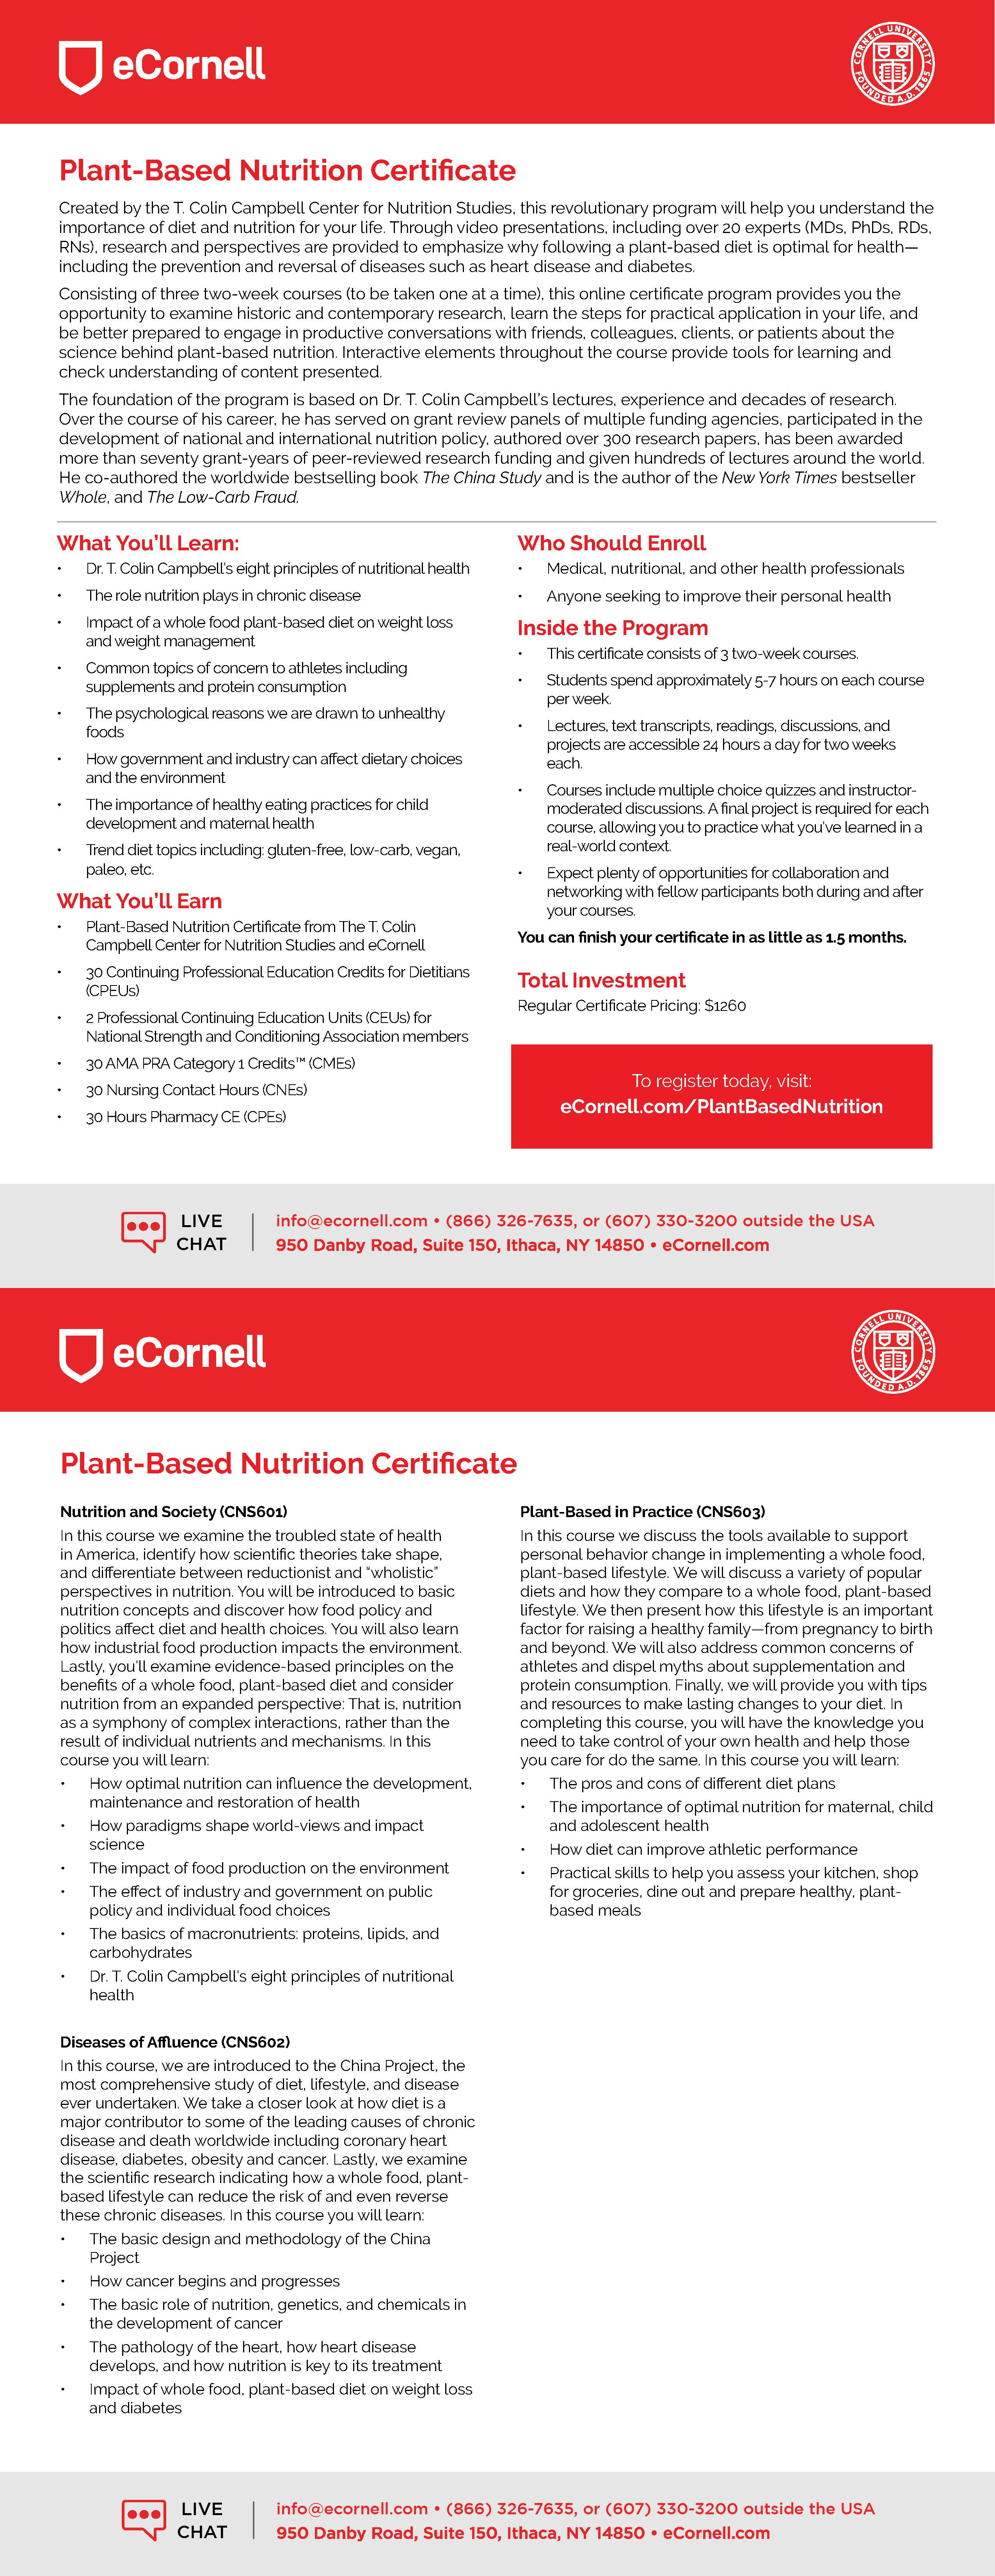 Plant-Based Nutrition Flyer